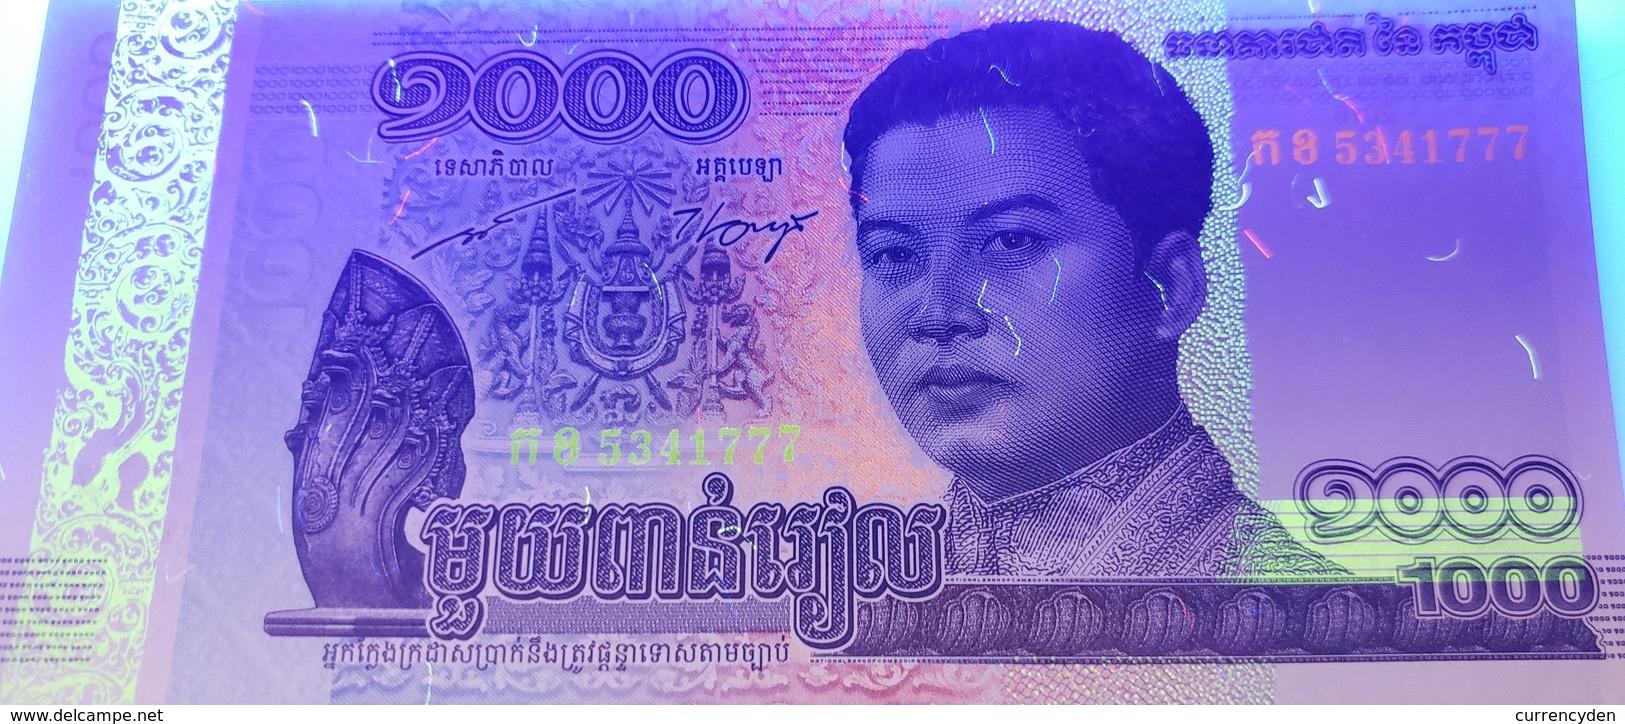 Cambodia P-NEW, 1000 Riel, Snake / Palace, Human-bird Figure, 2016 UNC See UV/WM - Cambodia